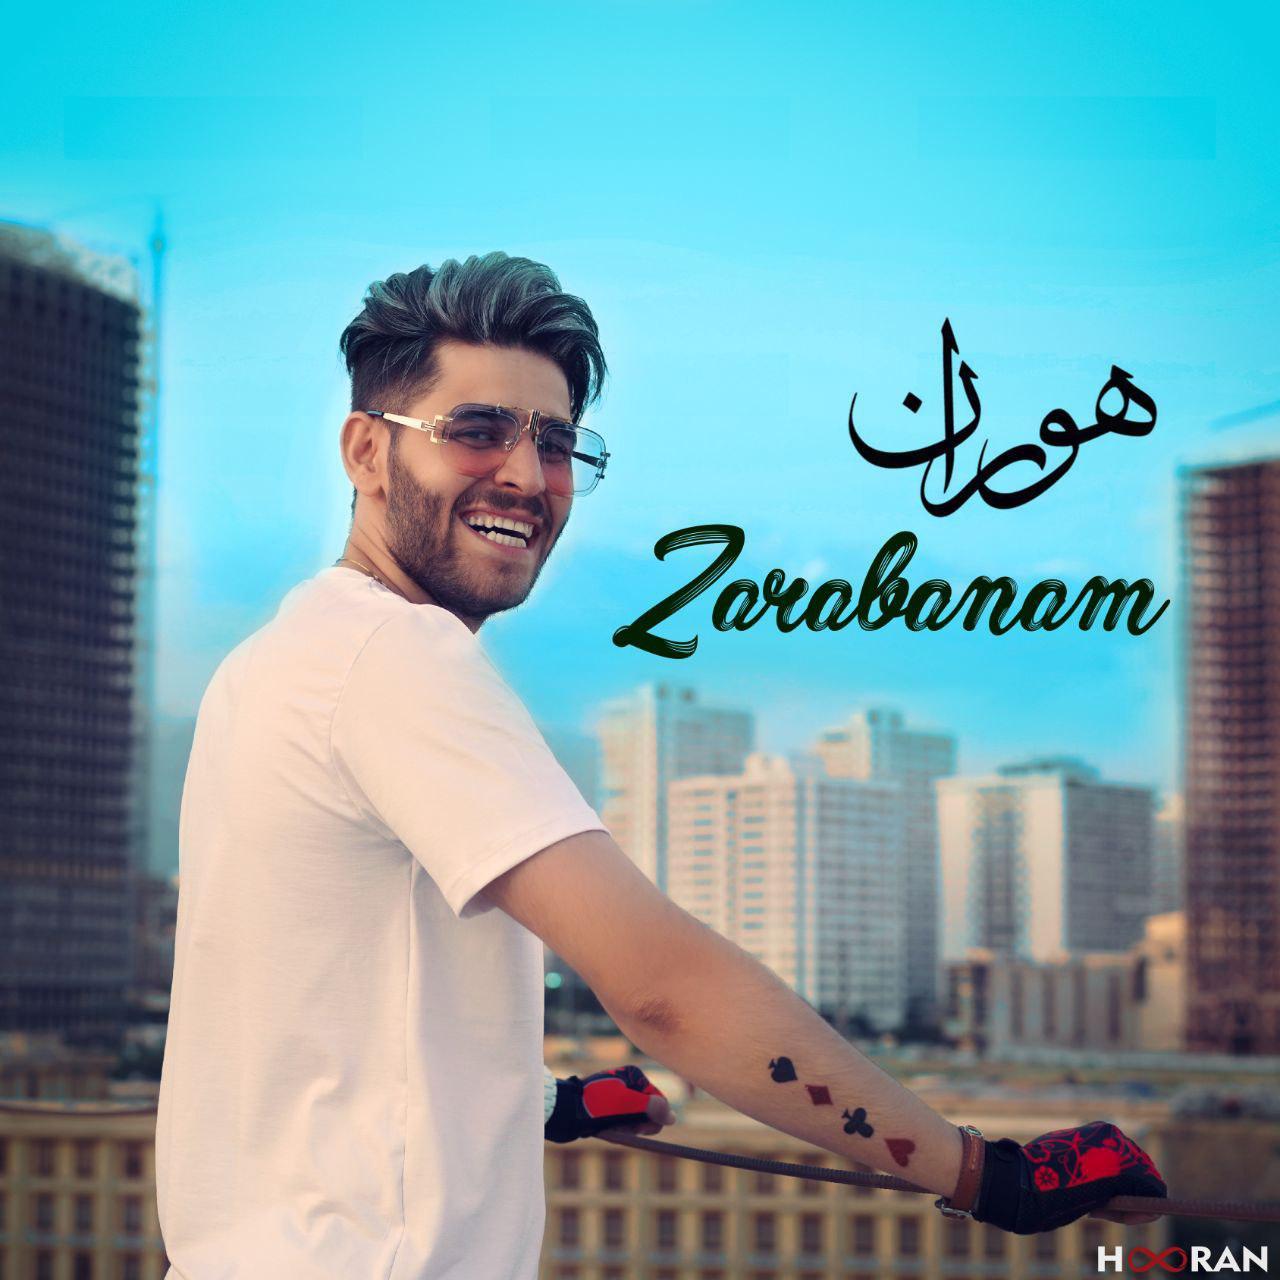 Hooran – Zarabanam